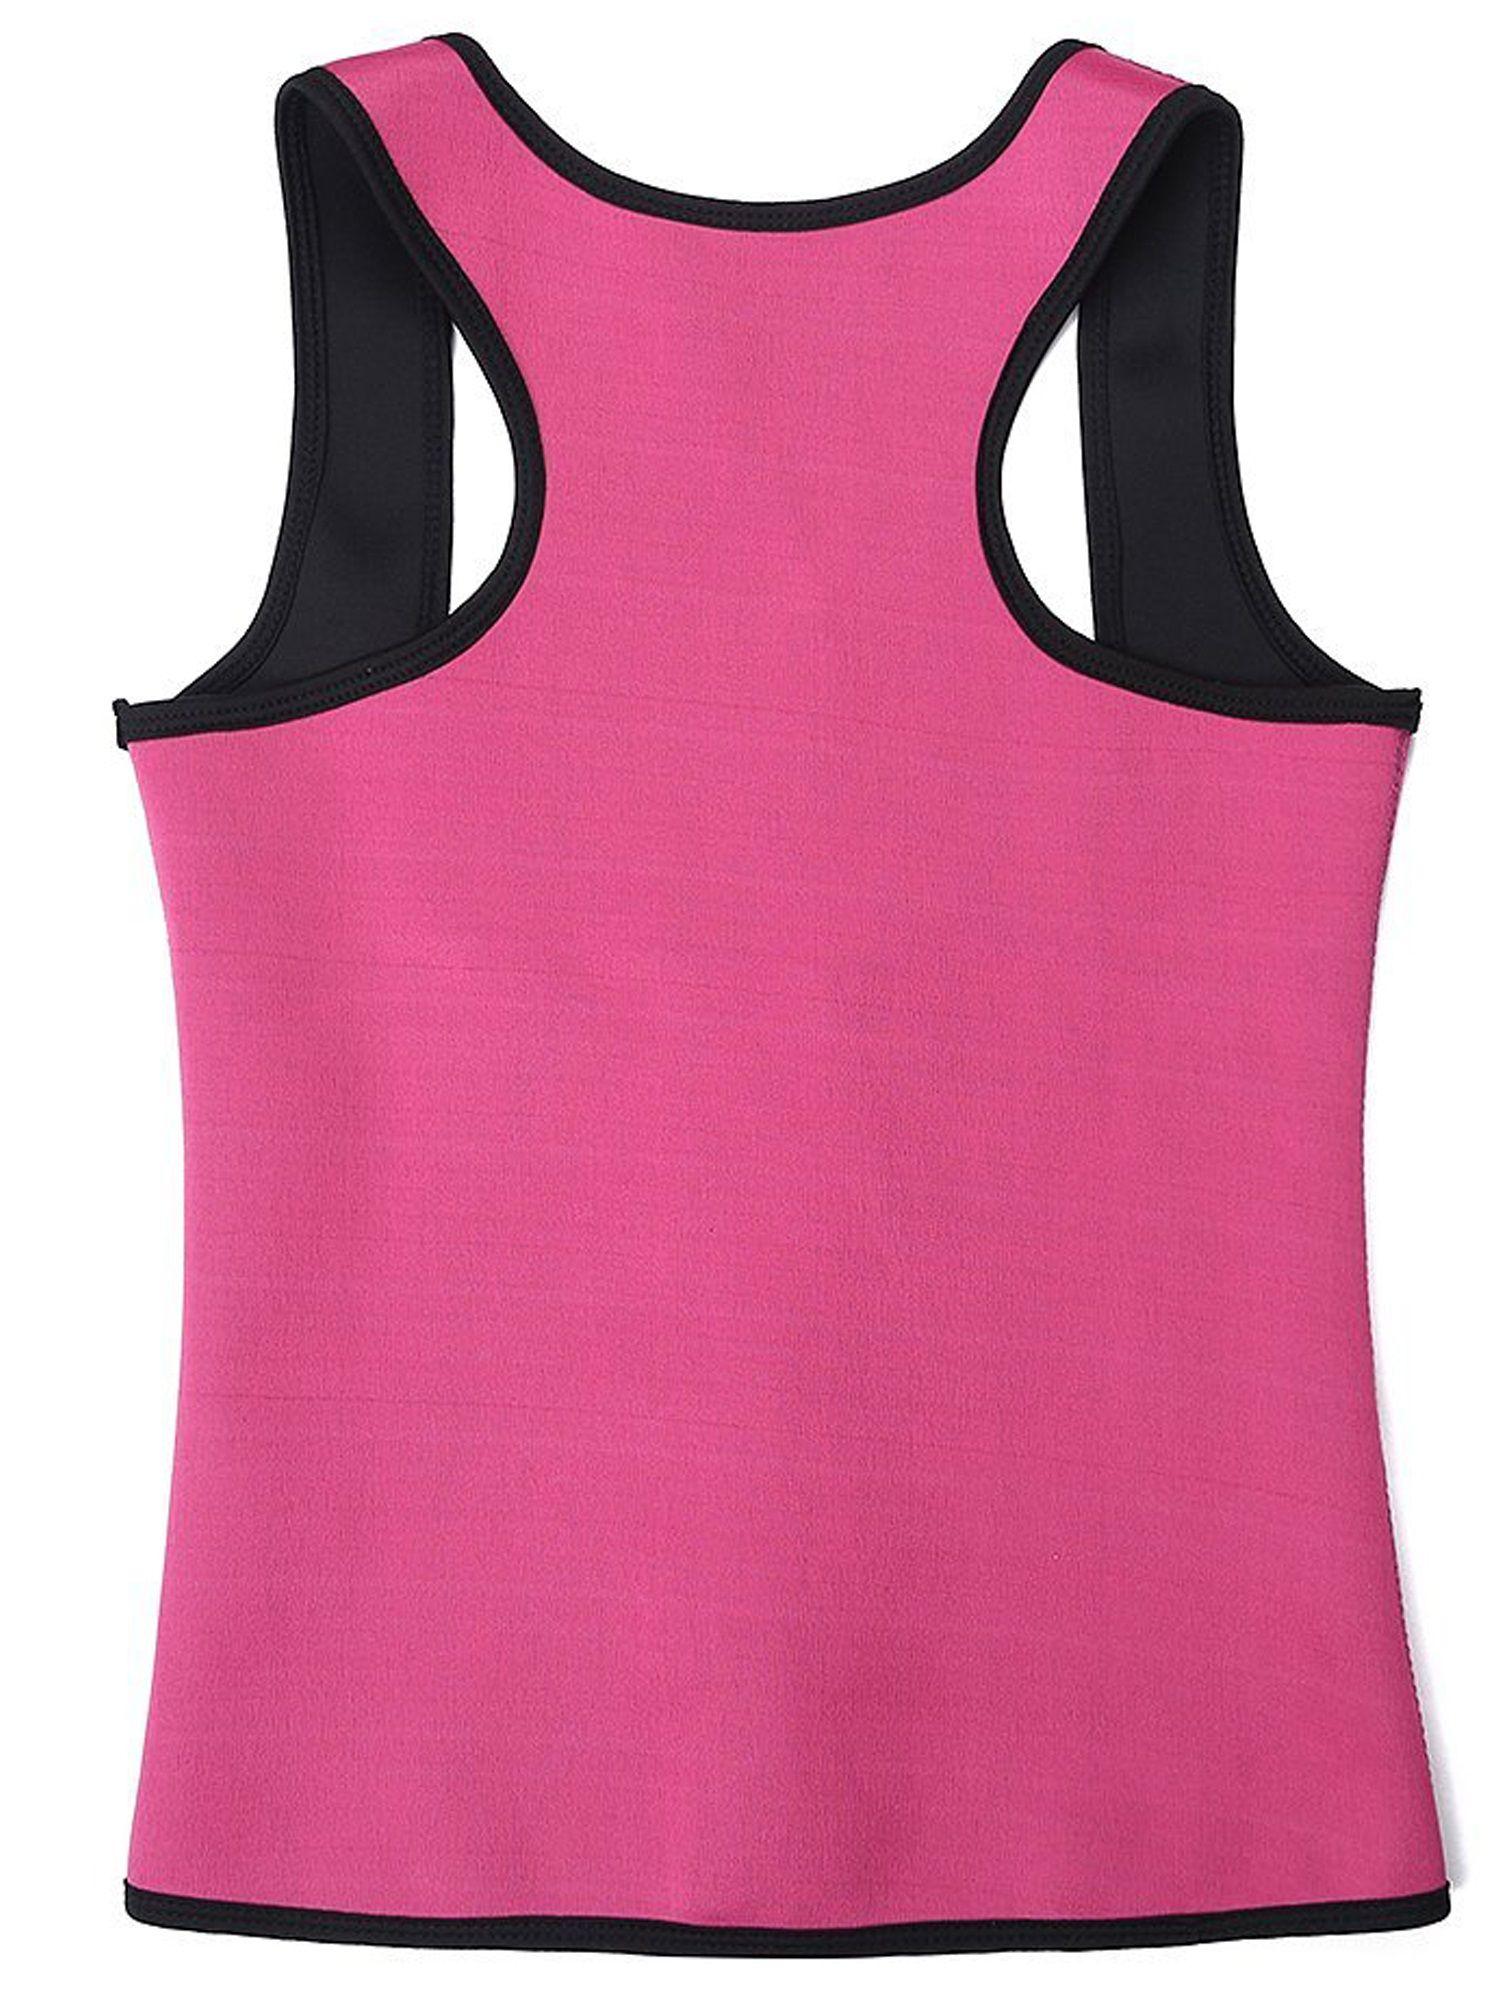 c9aaf41381d SAYFUT Women s Shapewear Slimming Vest Waist Trainer Body Shaper Corset Hot  Sweat Neoprene Weight Loss Tank Top Tummy Control Sauna Suit Trainer